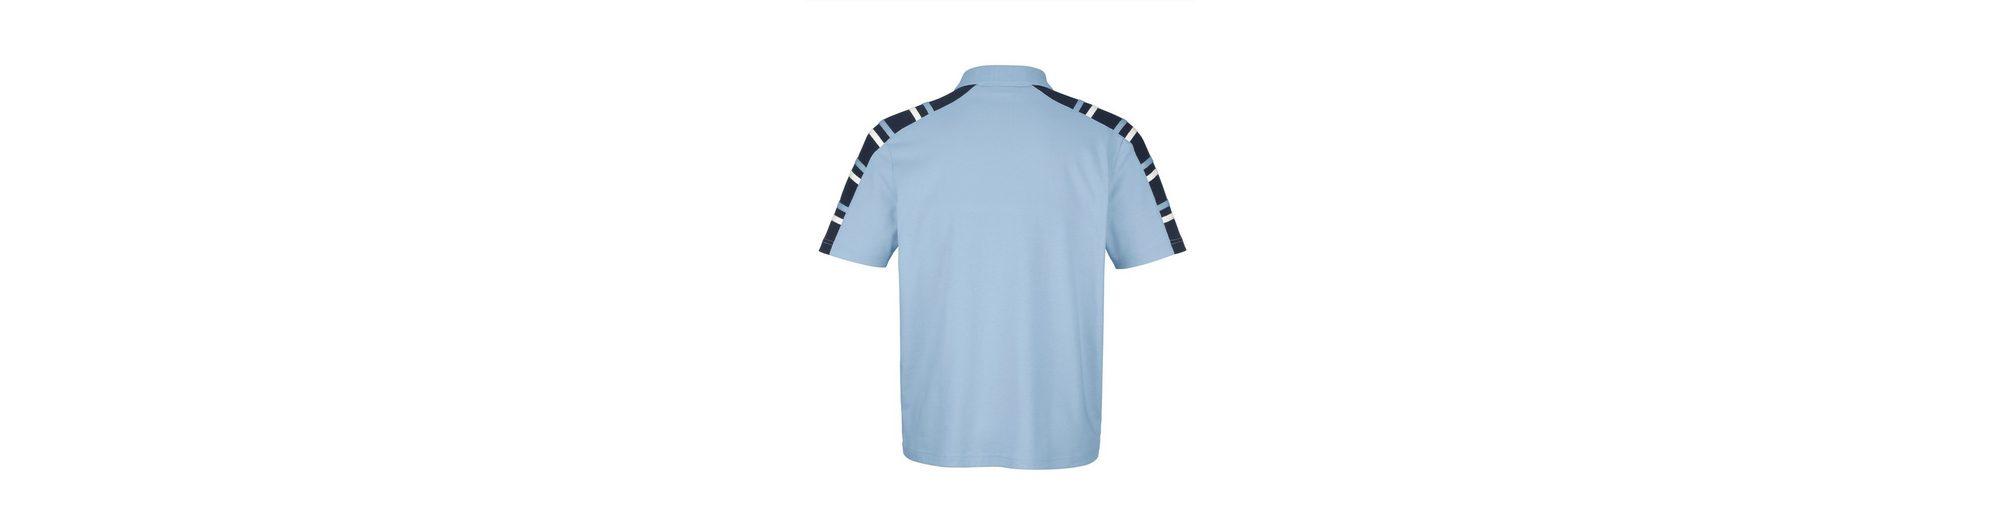 Roger Kent Poloshirt mit praktischer Brusttasche Auslass Offizielle Seite dY0v6